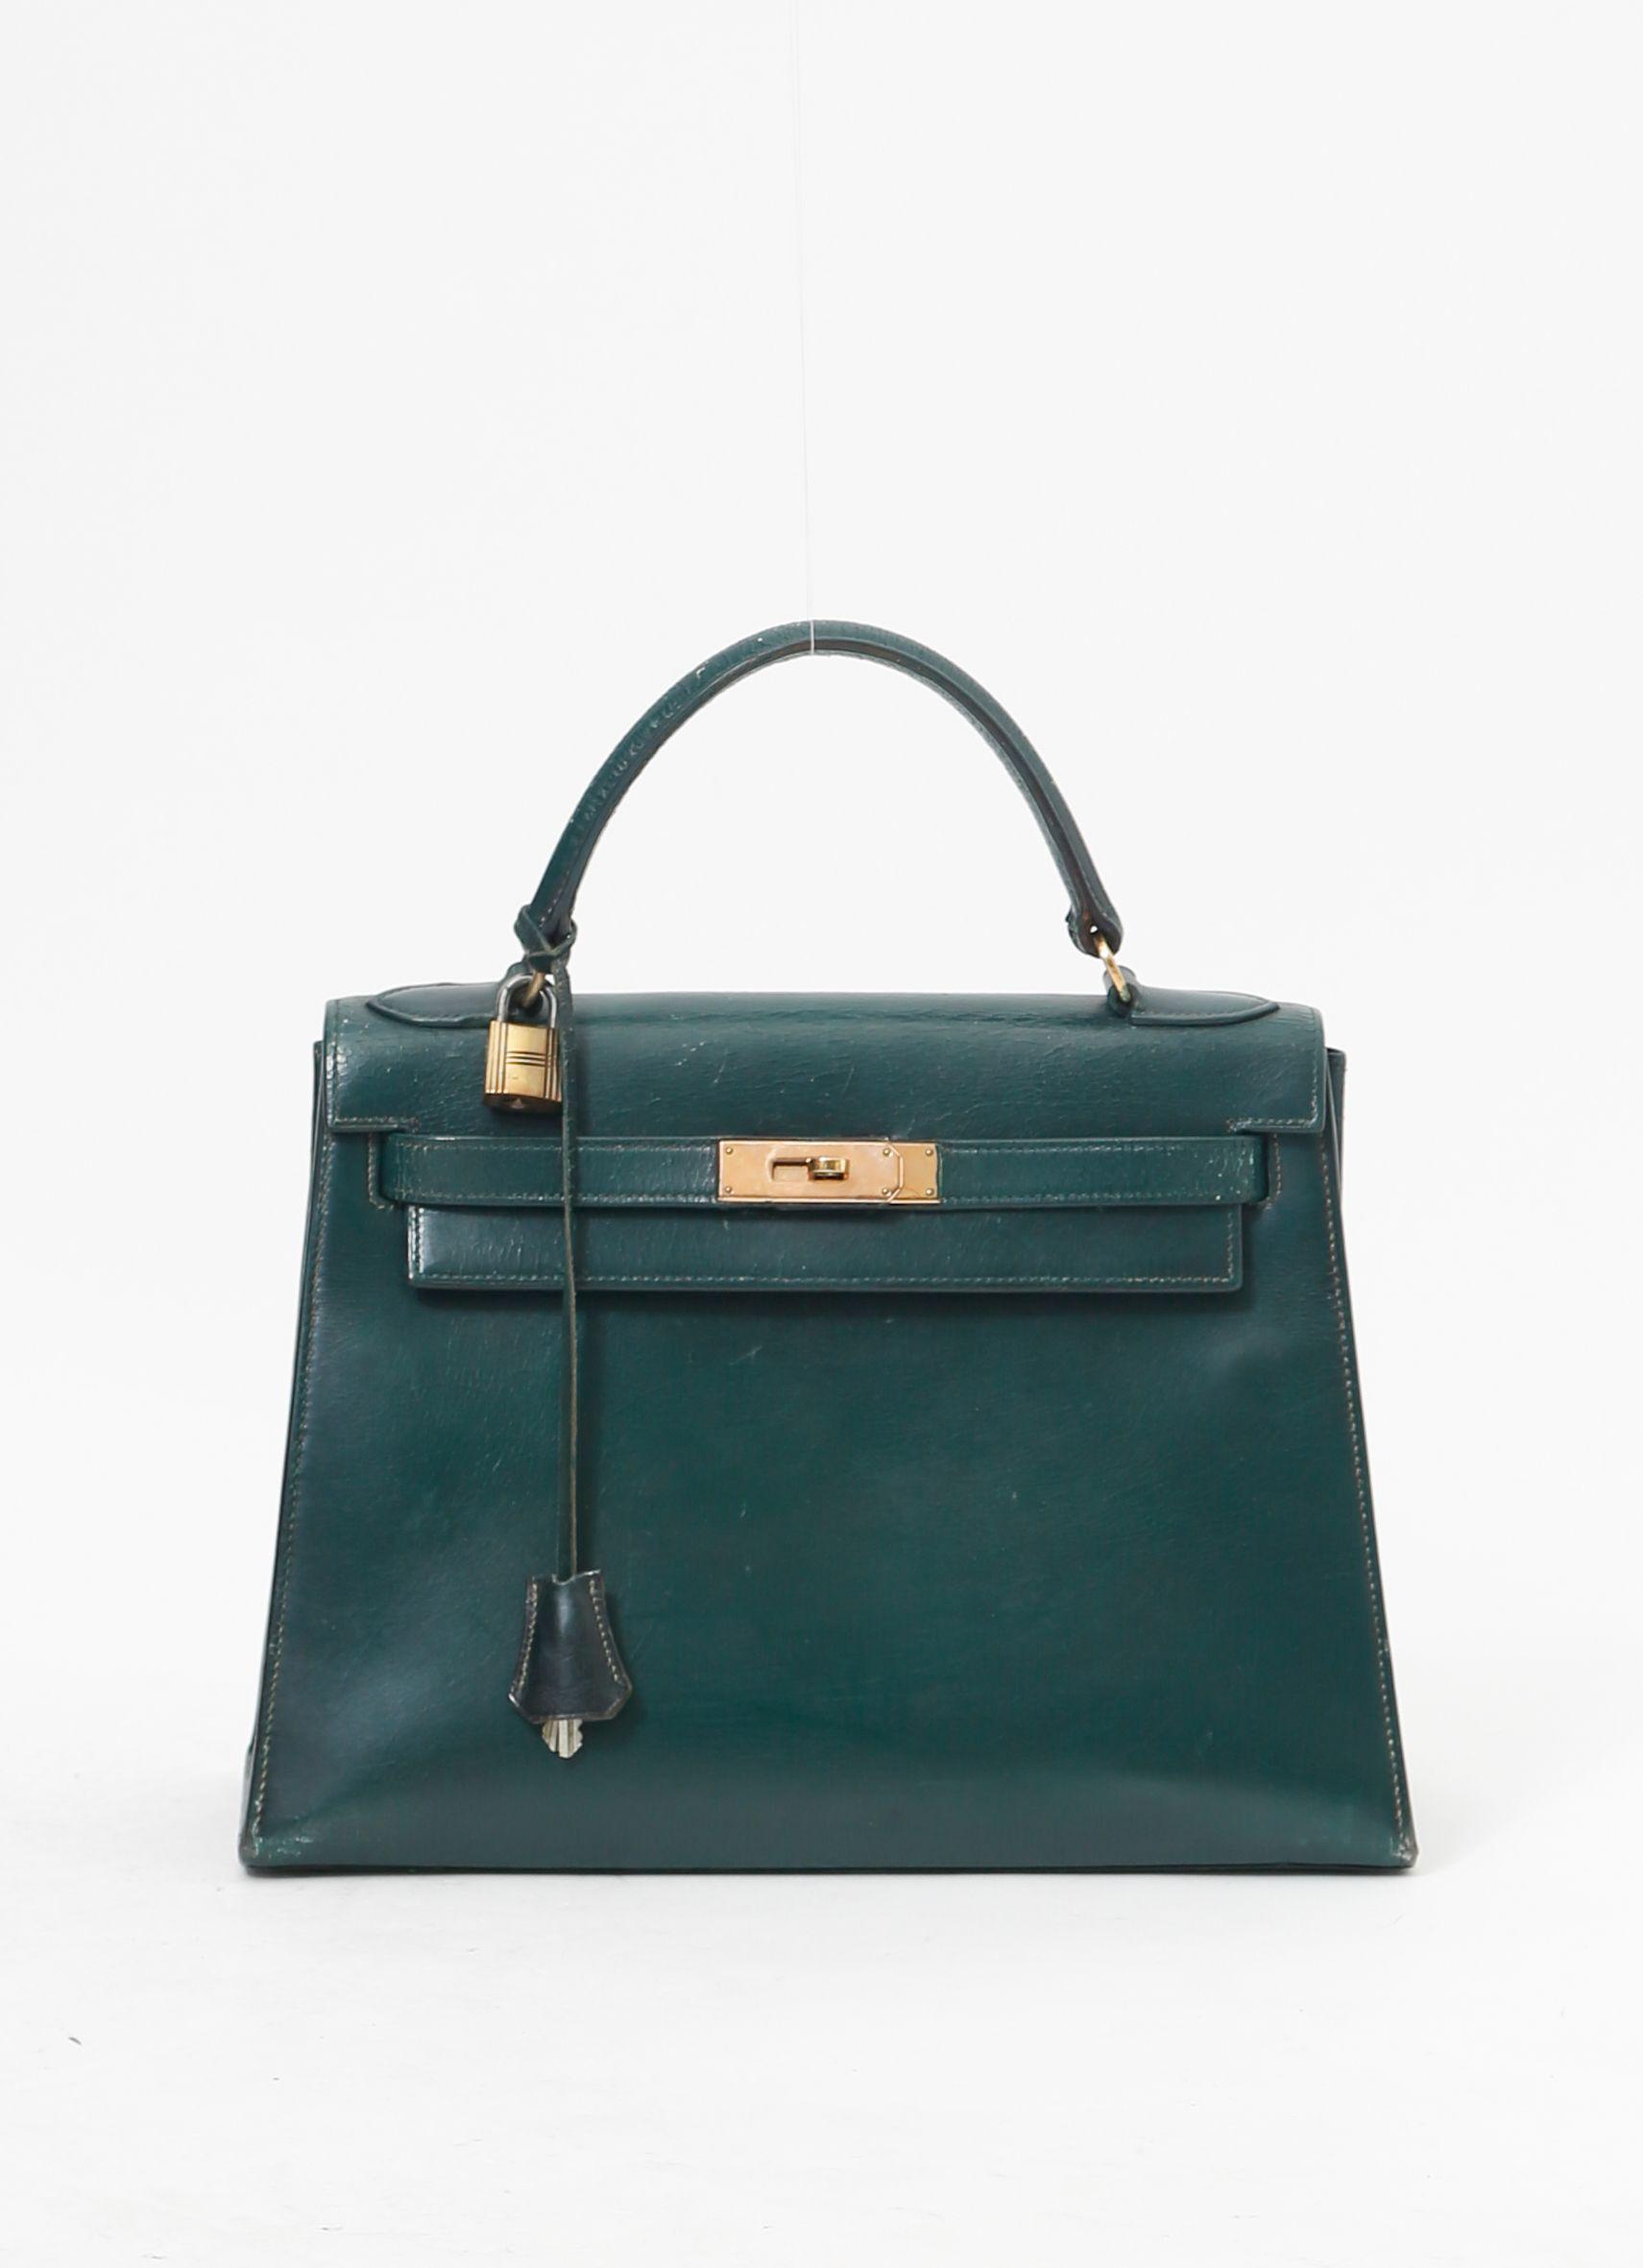 5127becedb31  70s Green Hermès Kelly Bag